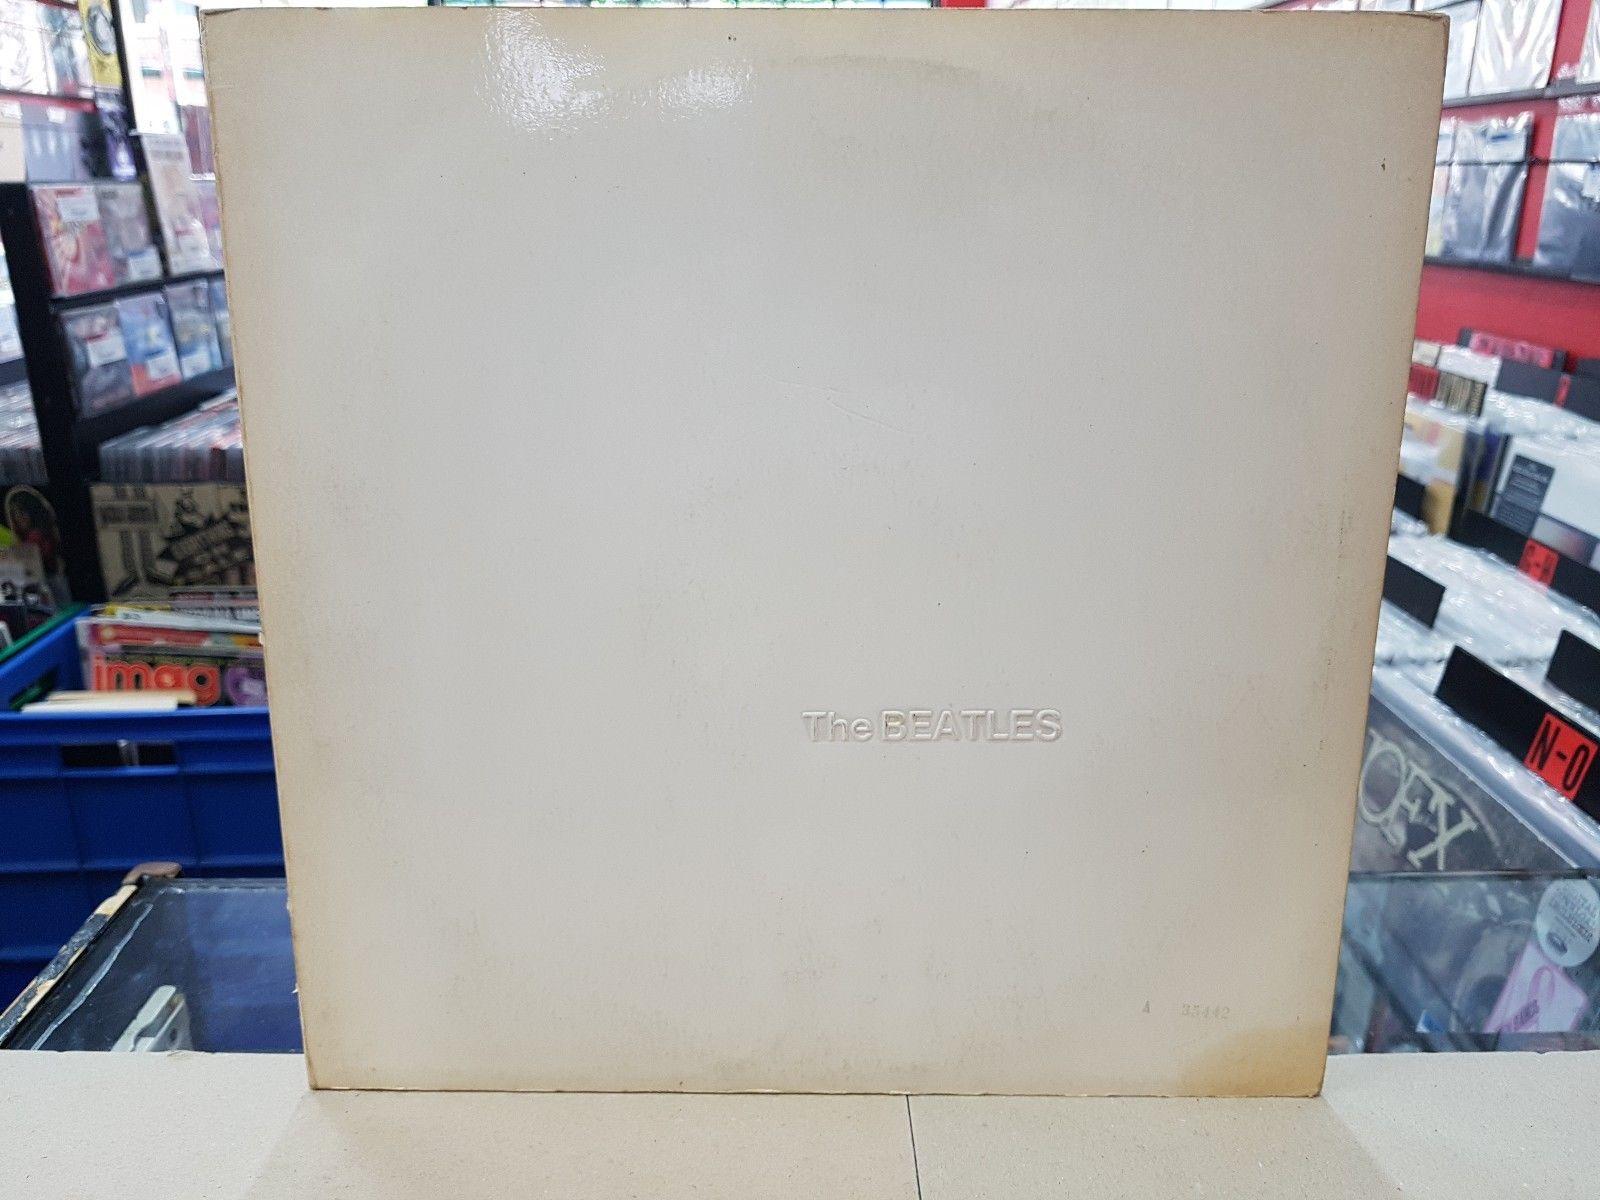 THE BEATLES-WHITE ALBUM-VINYL 2xLP-OZ-1968-INSERTS-NUMBERED-MISPRESS -RARE-PCSO